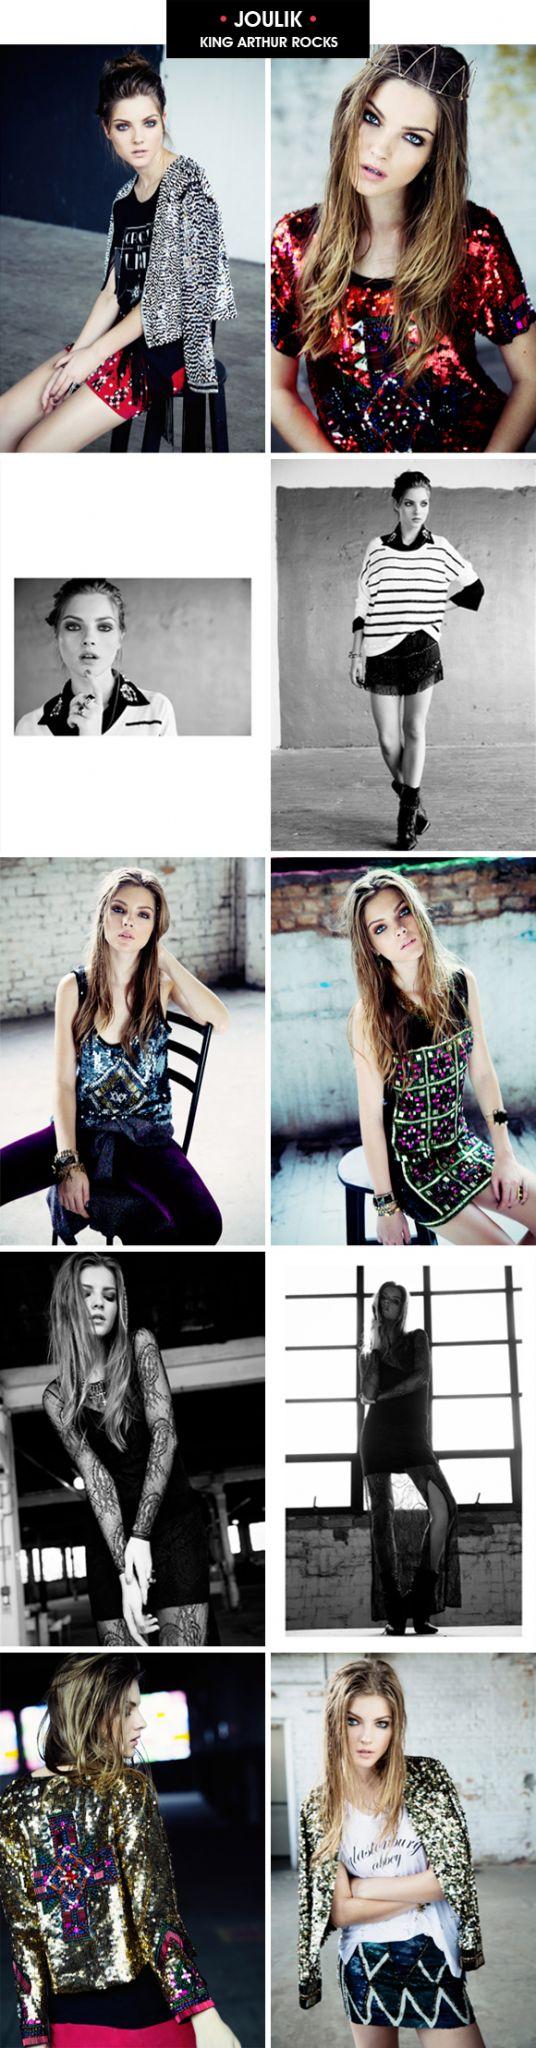 Achados da Bia | Moda | Lançamento Inverno 2013 | Joulik | King Arthur